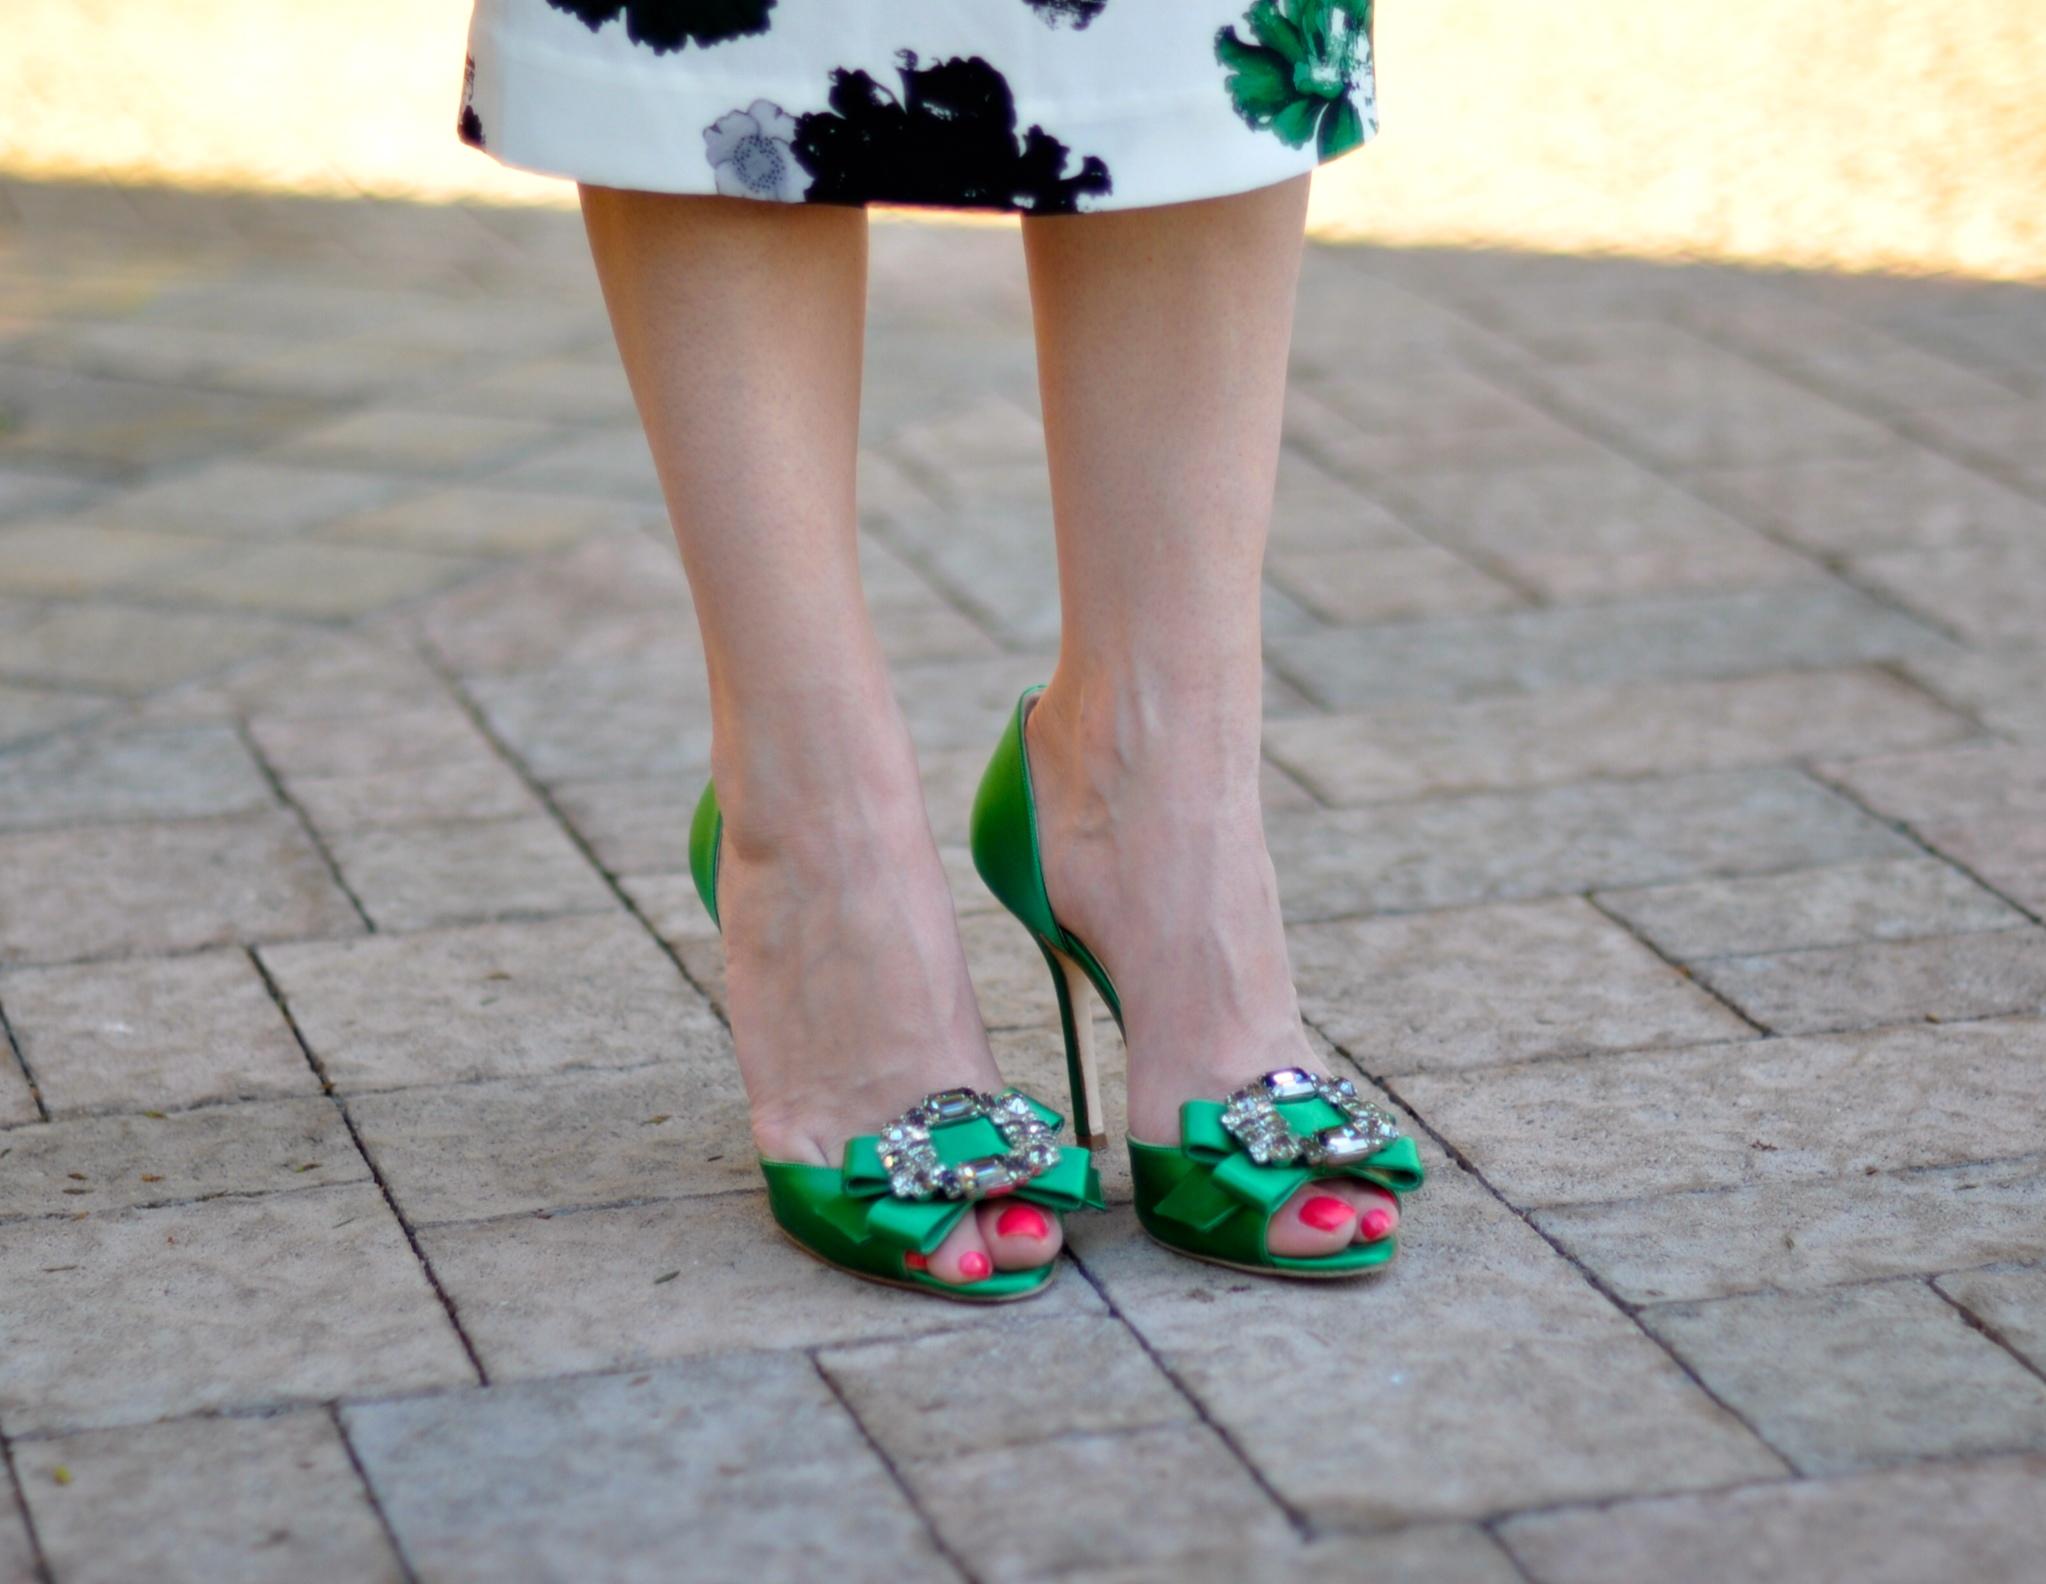 alc skirt, dolce & Gabbana top, chanel handbag, fashion blogger, oscar de la renta shoes, tutu janie & Jack dress